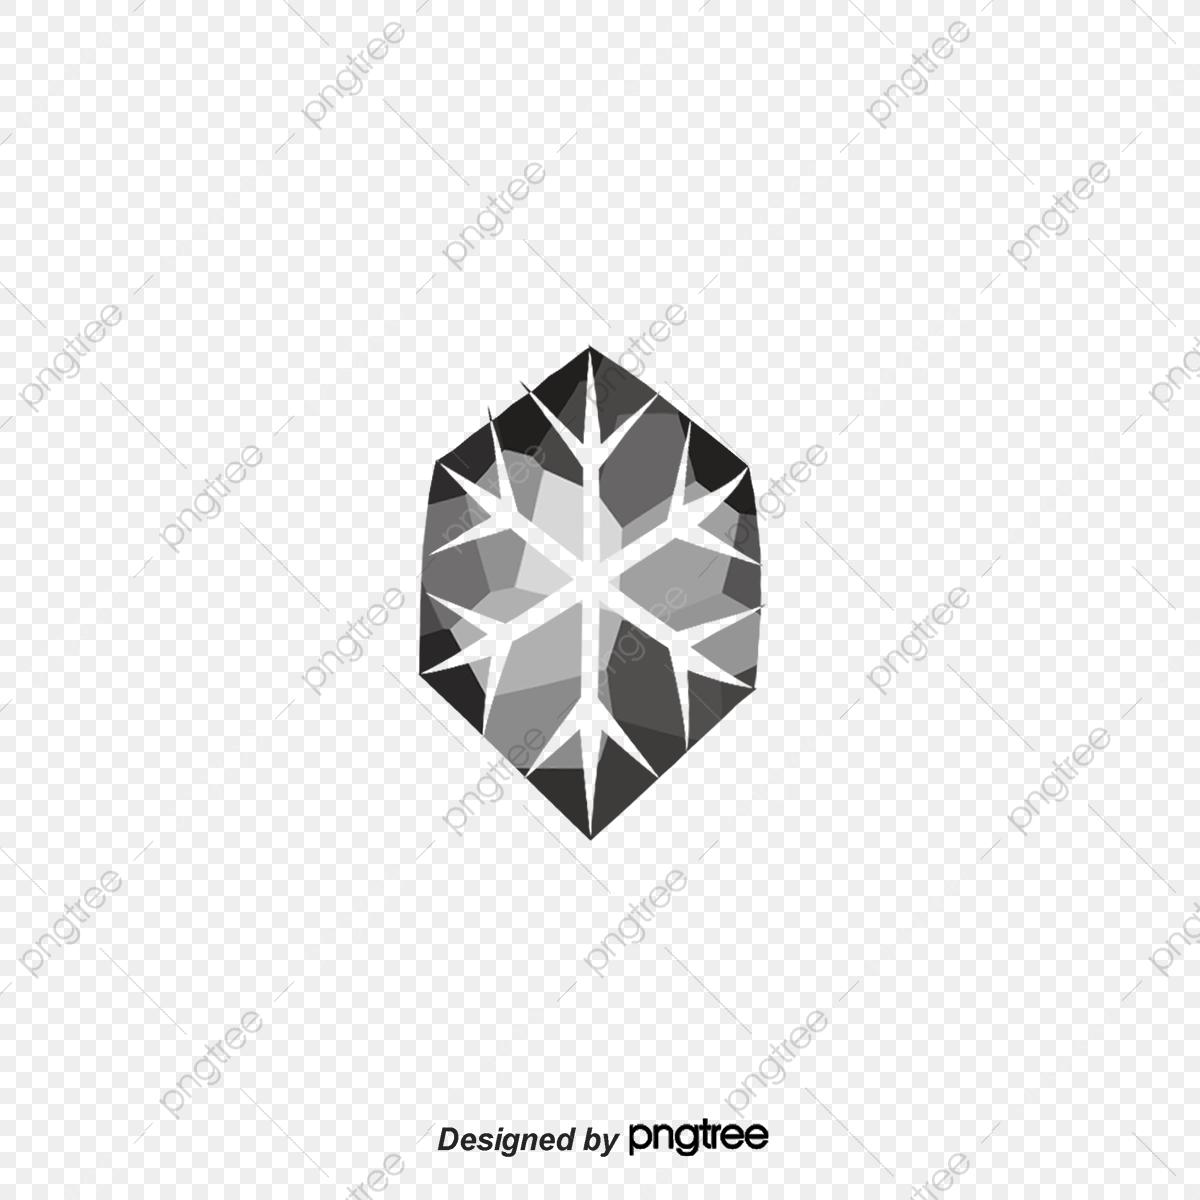 Black Diamond, Diamond Clipart, Black, Diamond PNG Transparent.